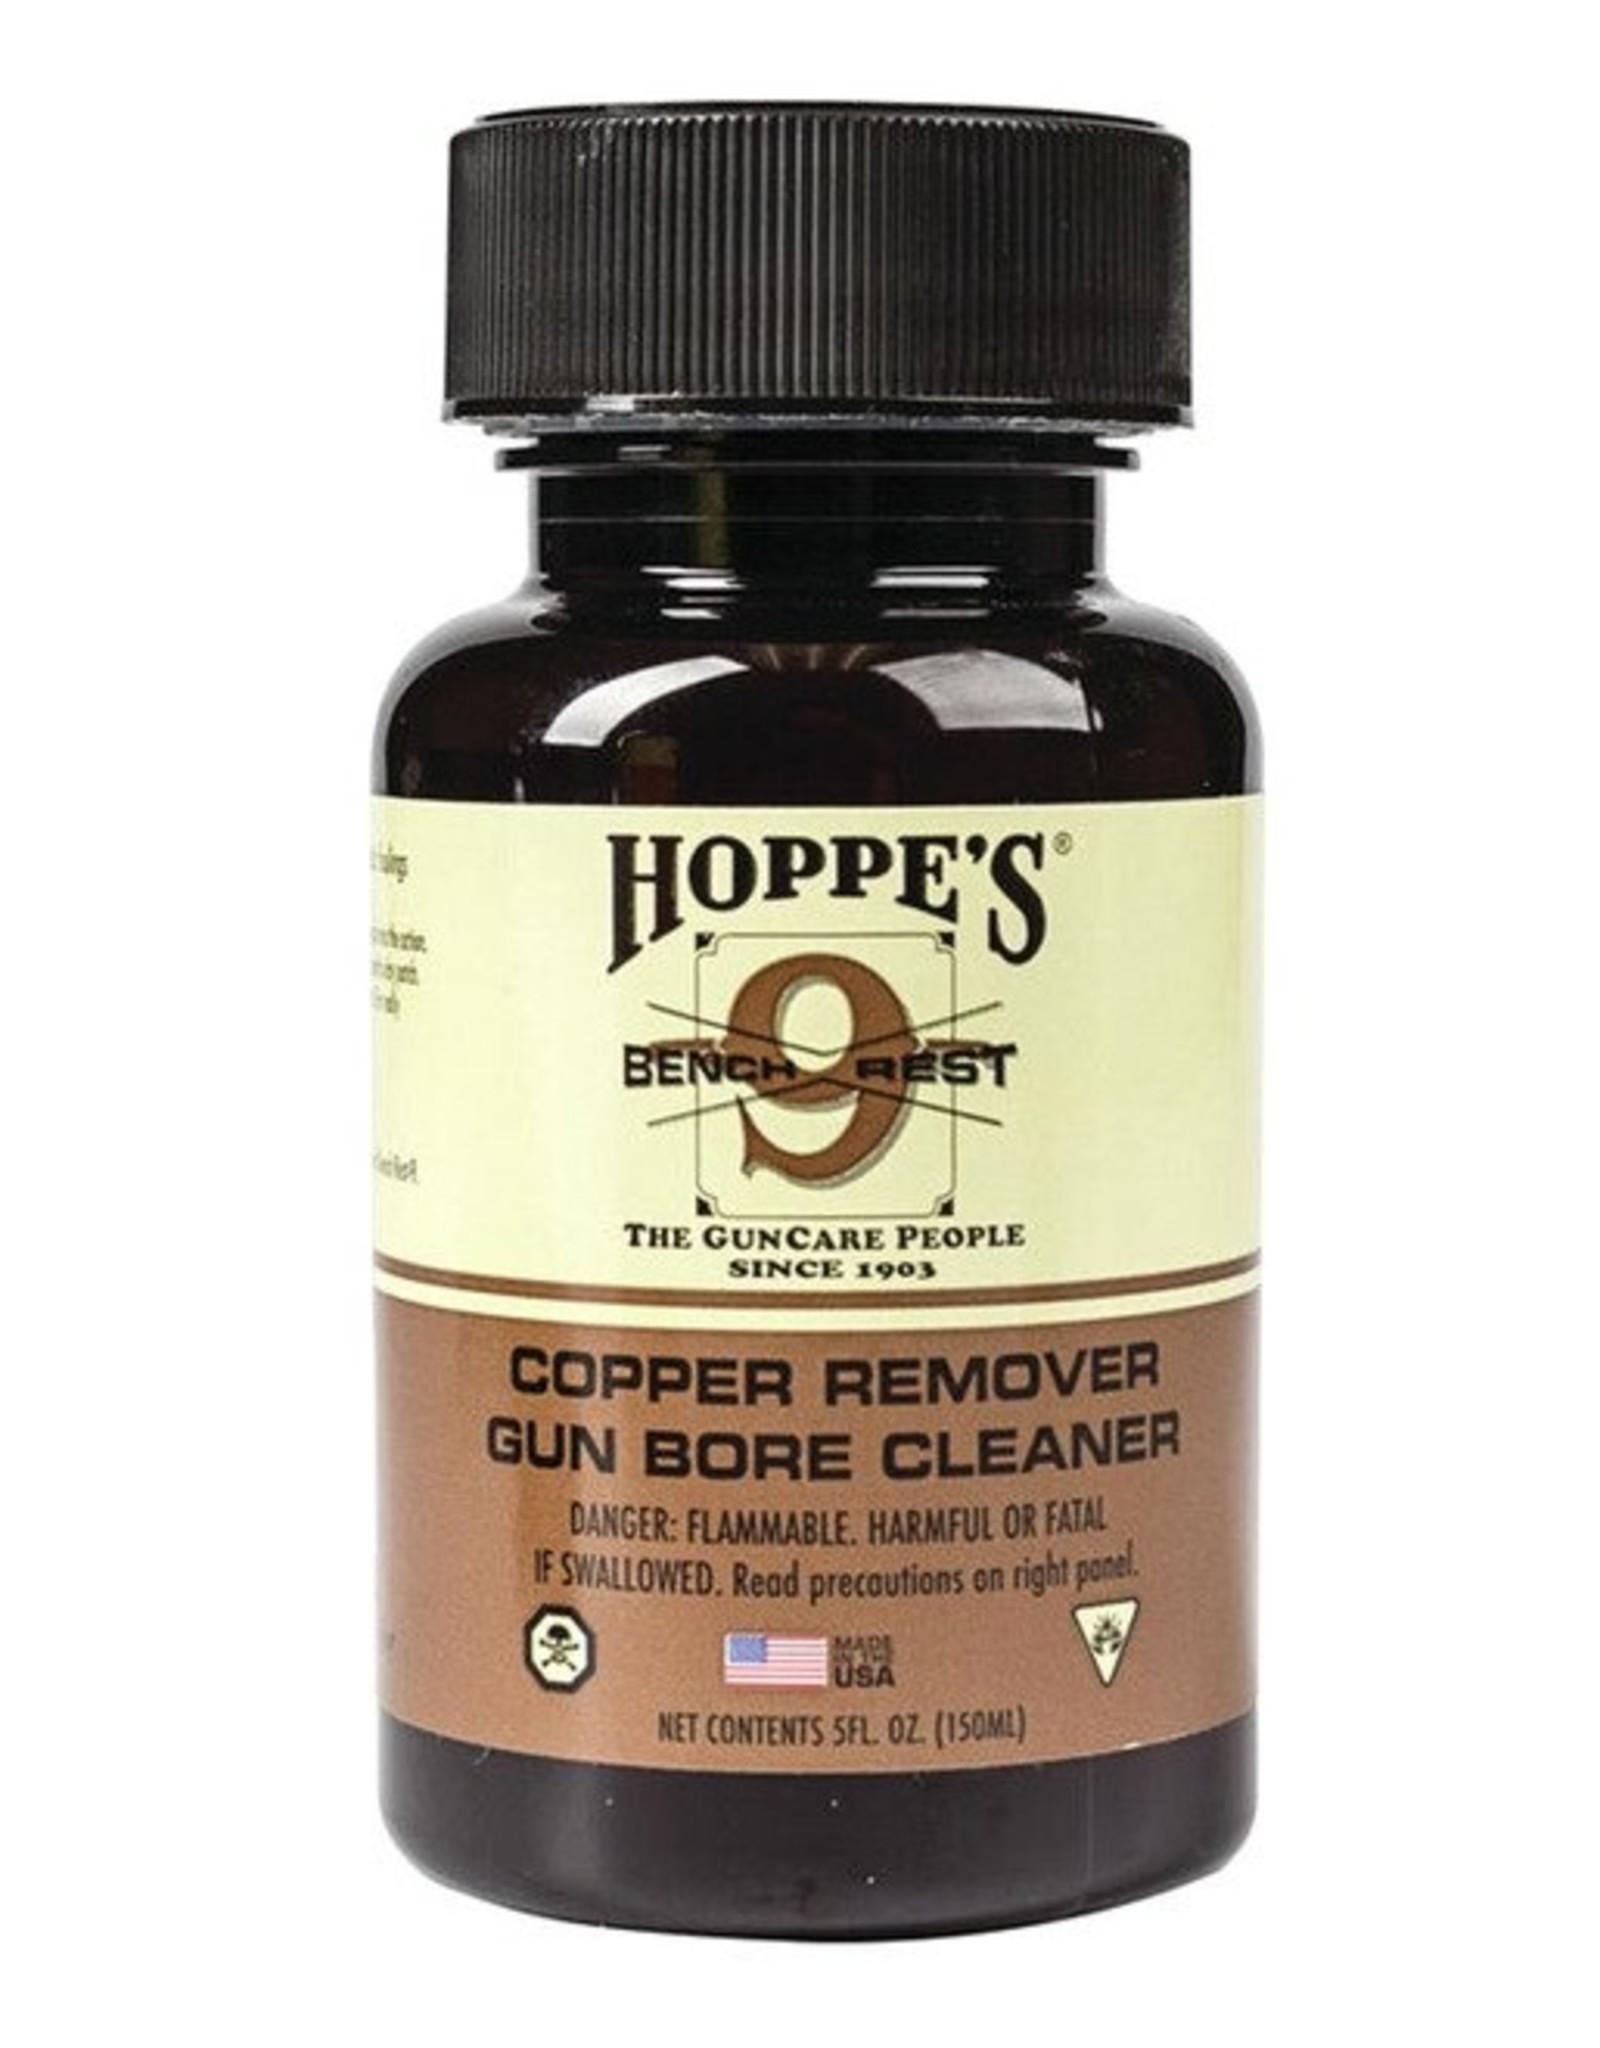 Hoppe's Bench Rest 9 Copper Solvent 4 OZ.